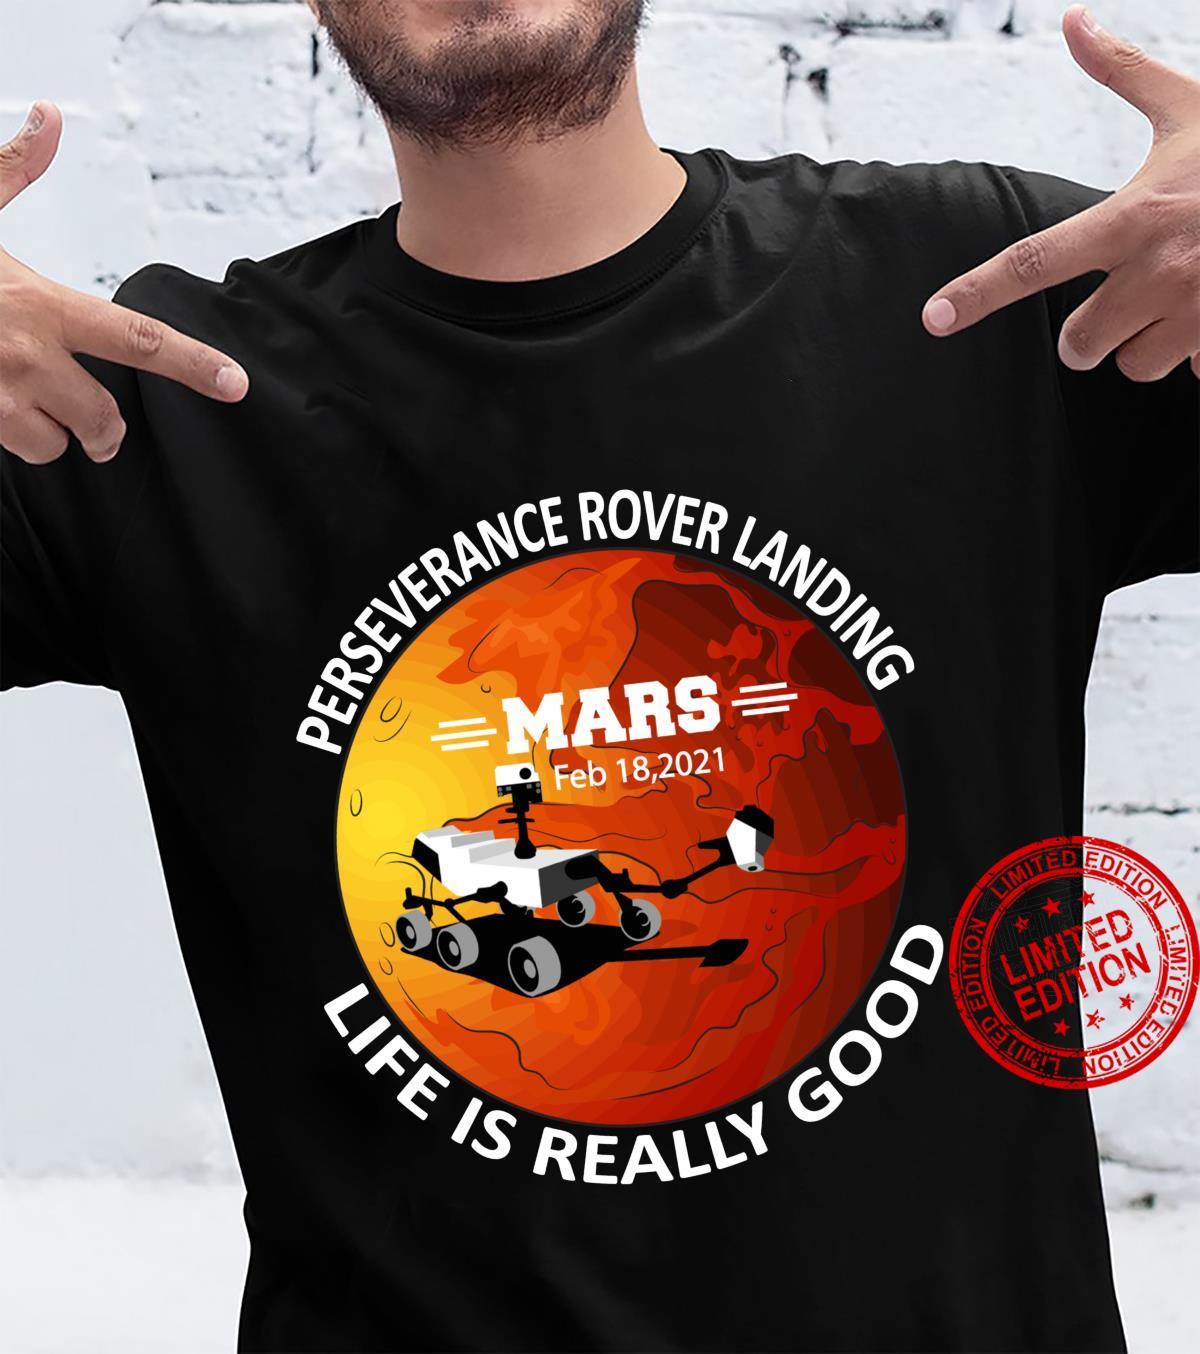 Life is Really Good Perseverance Rover Landing Mars 2021 Shirt